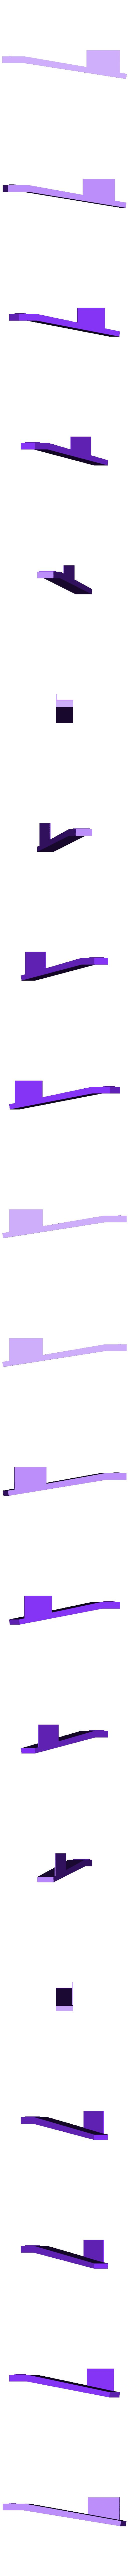 ressort avec jupe.STL Download free STL file Artillery Sidewinder x1 Z-axis screw adjustment • 3D printer design, Labidouille